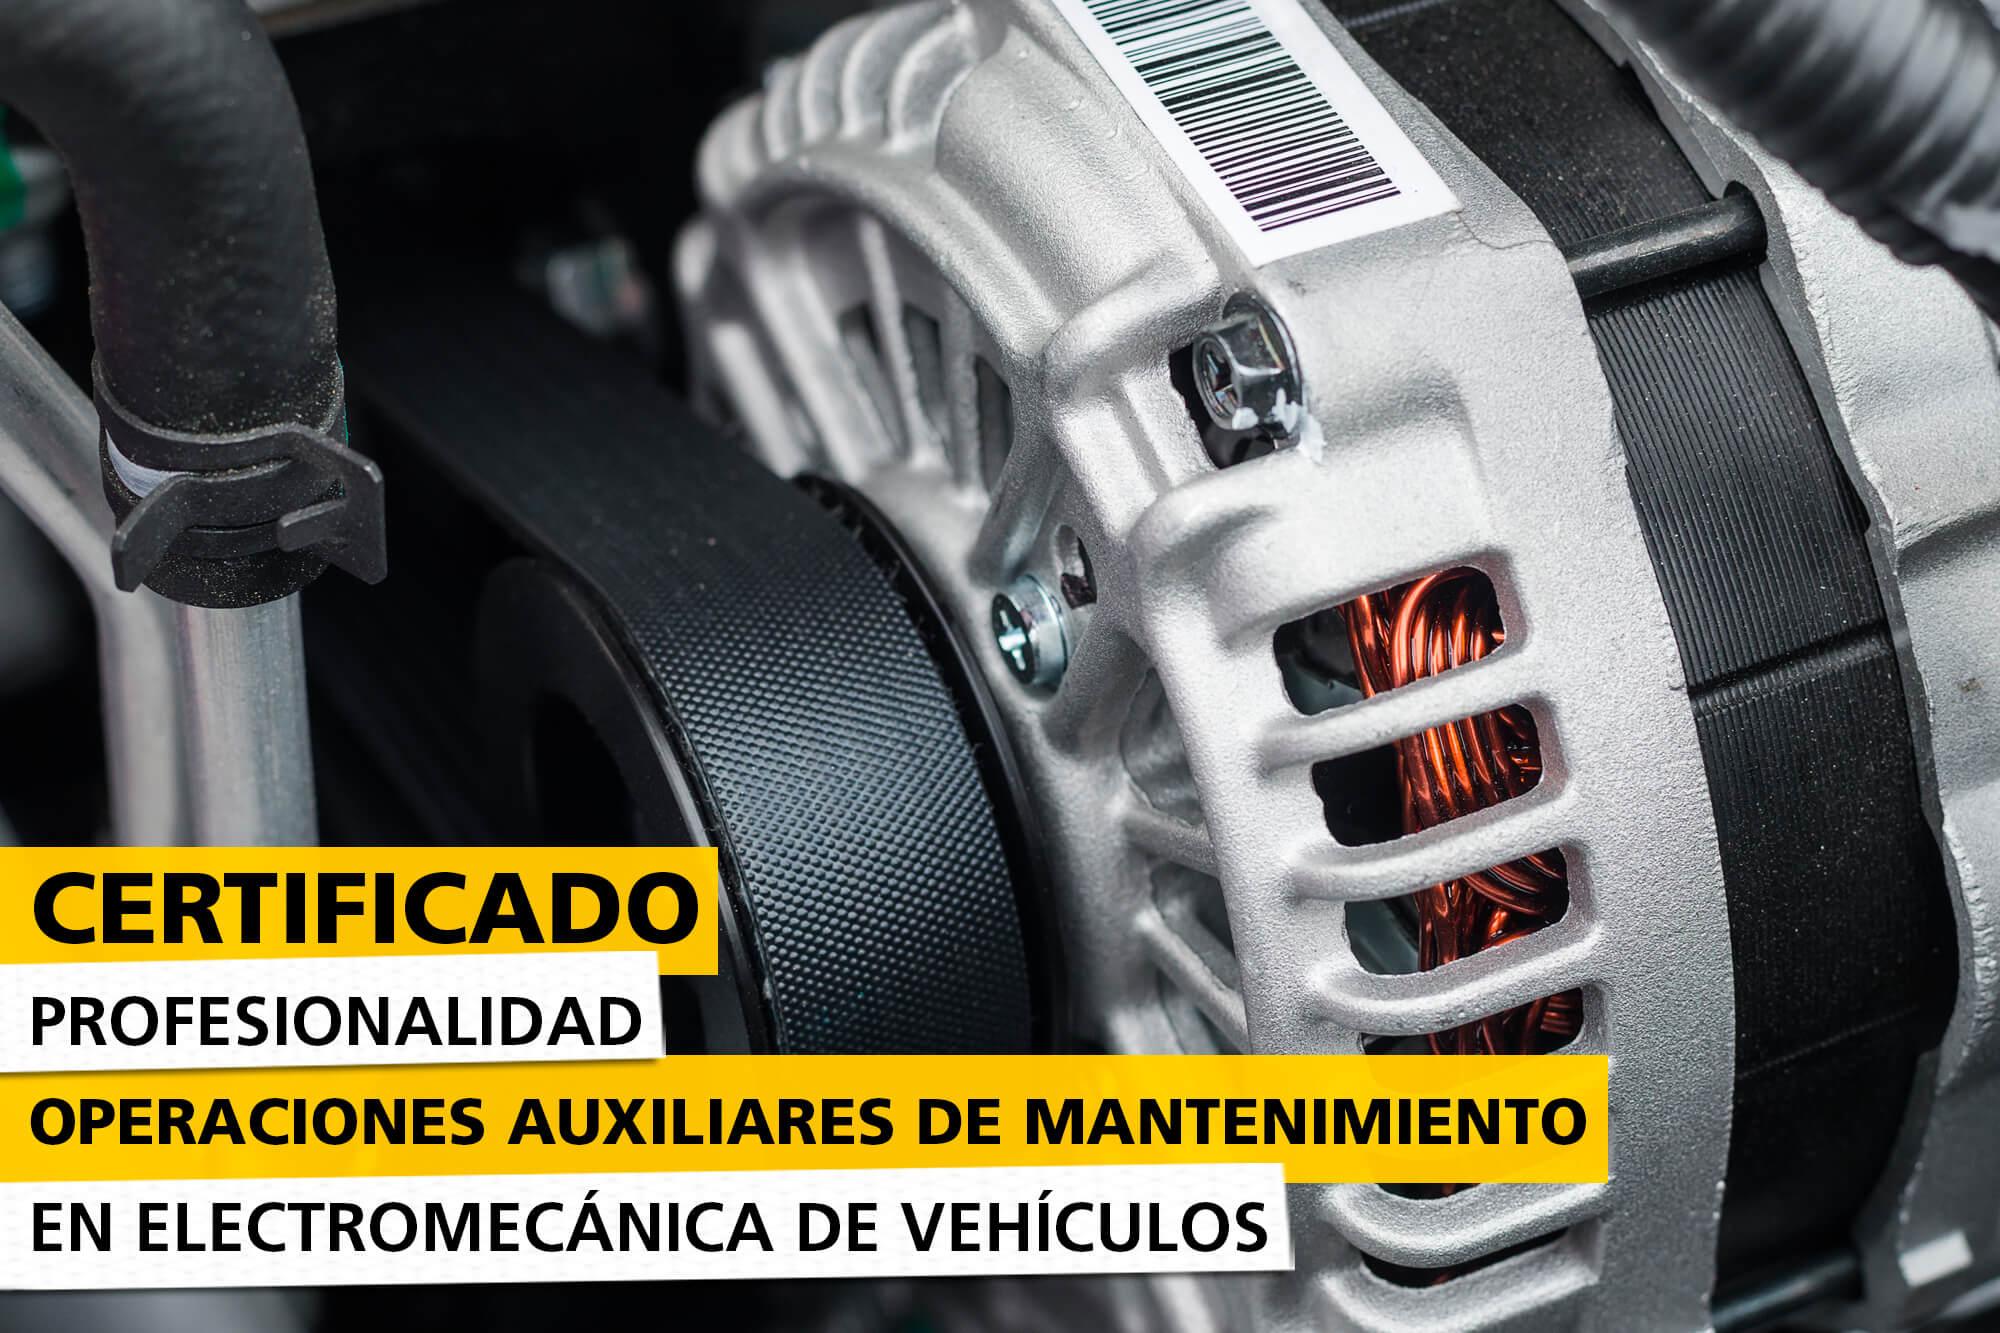 CP-operaciones-auxiliares-mantenimienti-electromecanica-vehiculos-img-destacada